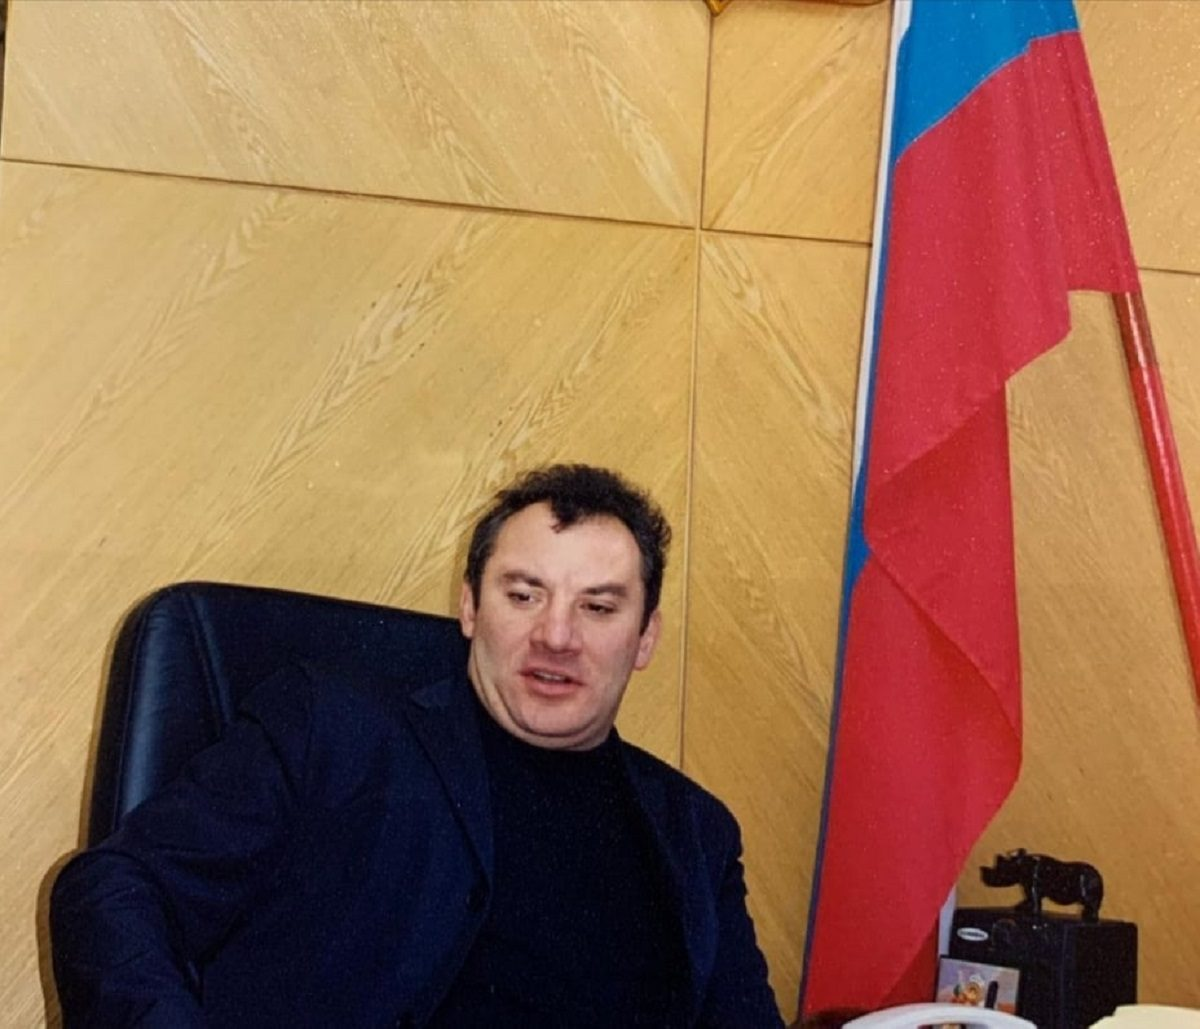 Актер Николай Фоменко 10 минут руководил Нижним Новгородом